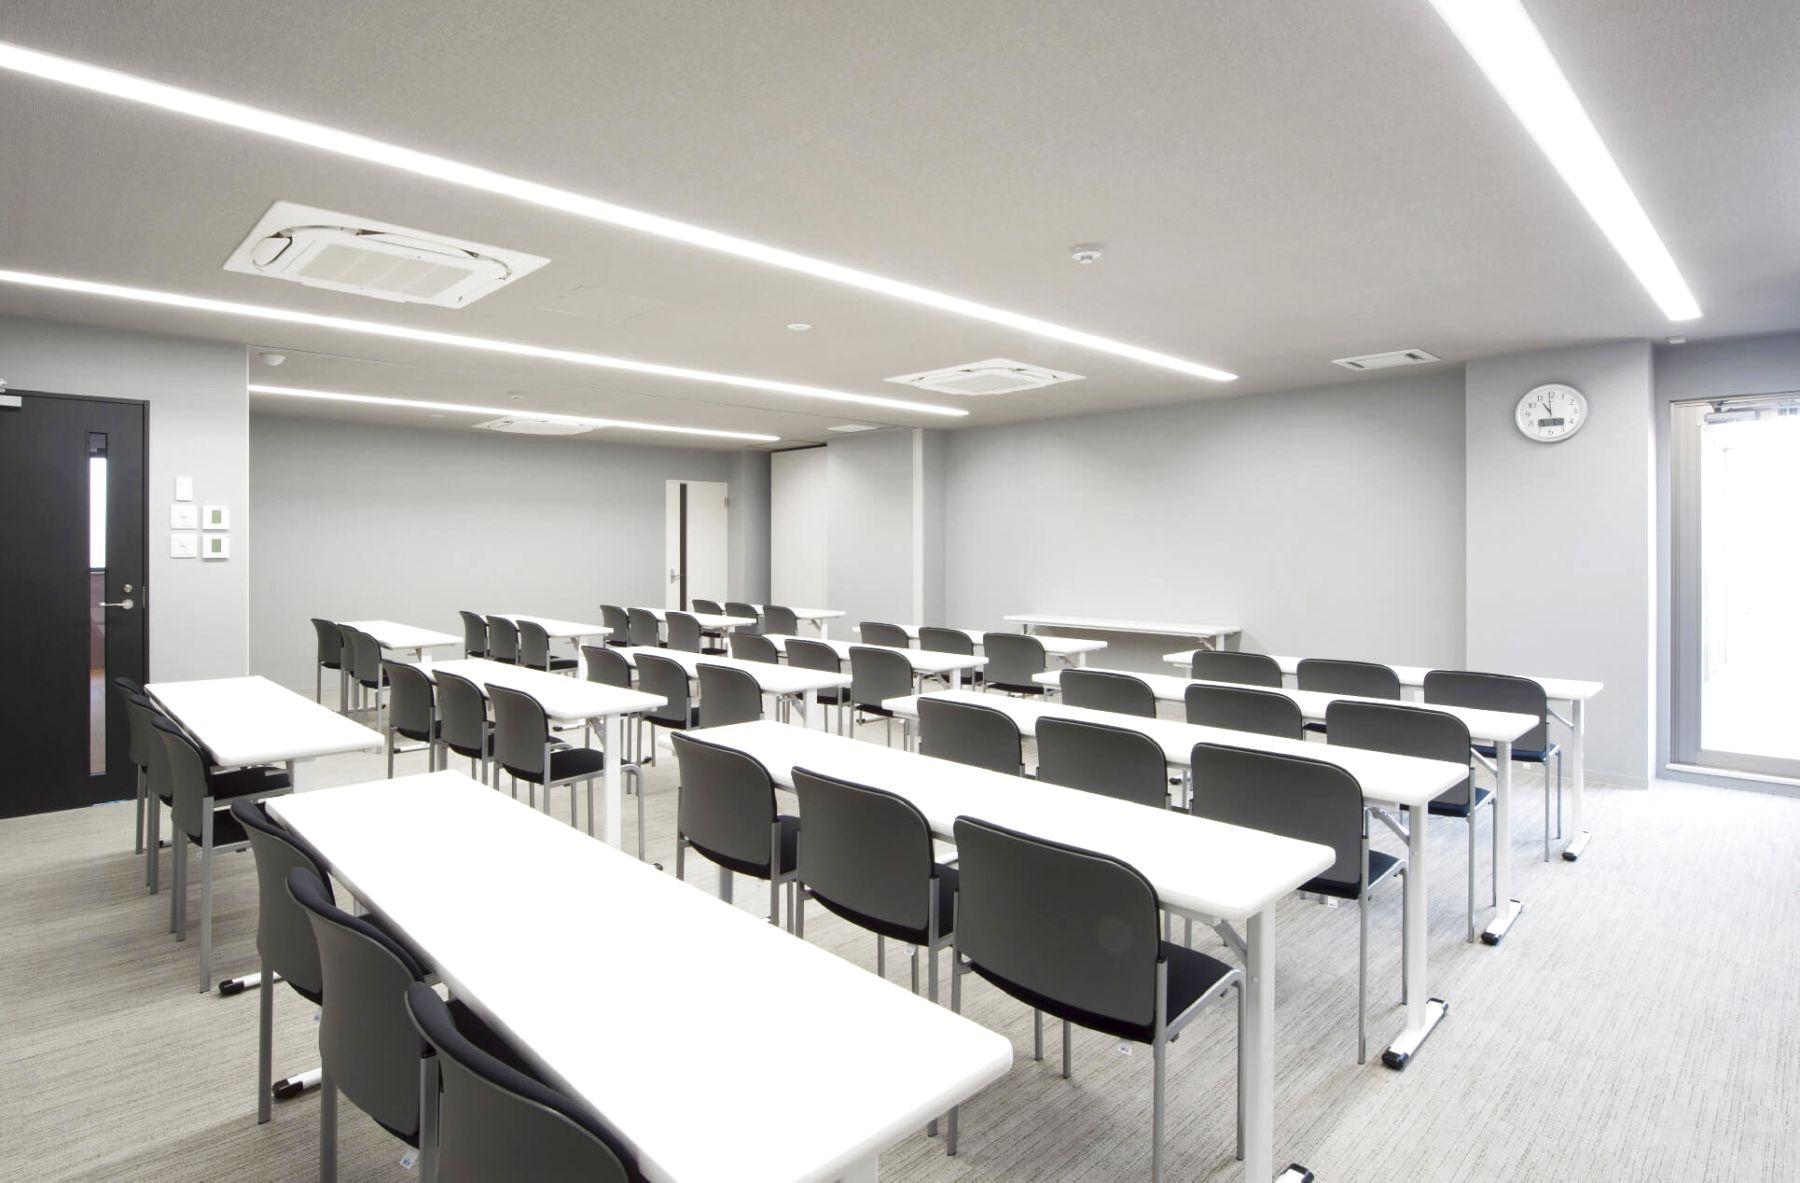 RITA白金カンファレンス 会議室A+B 501+502の室内の写真